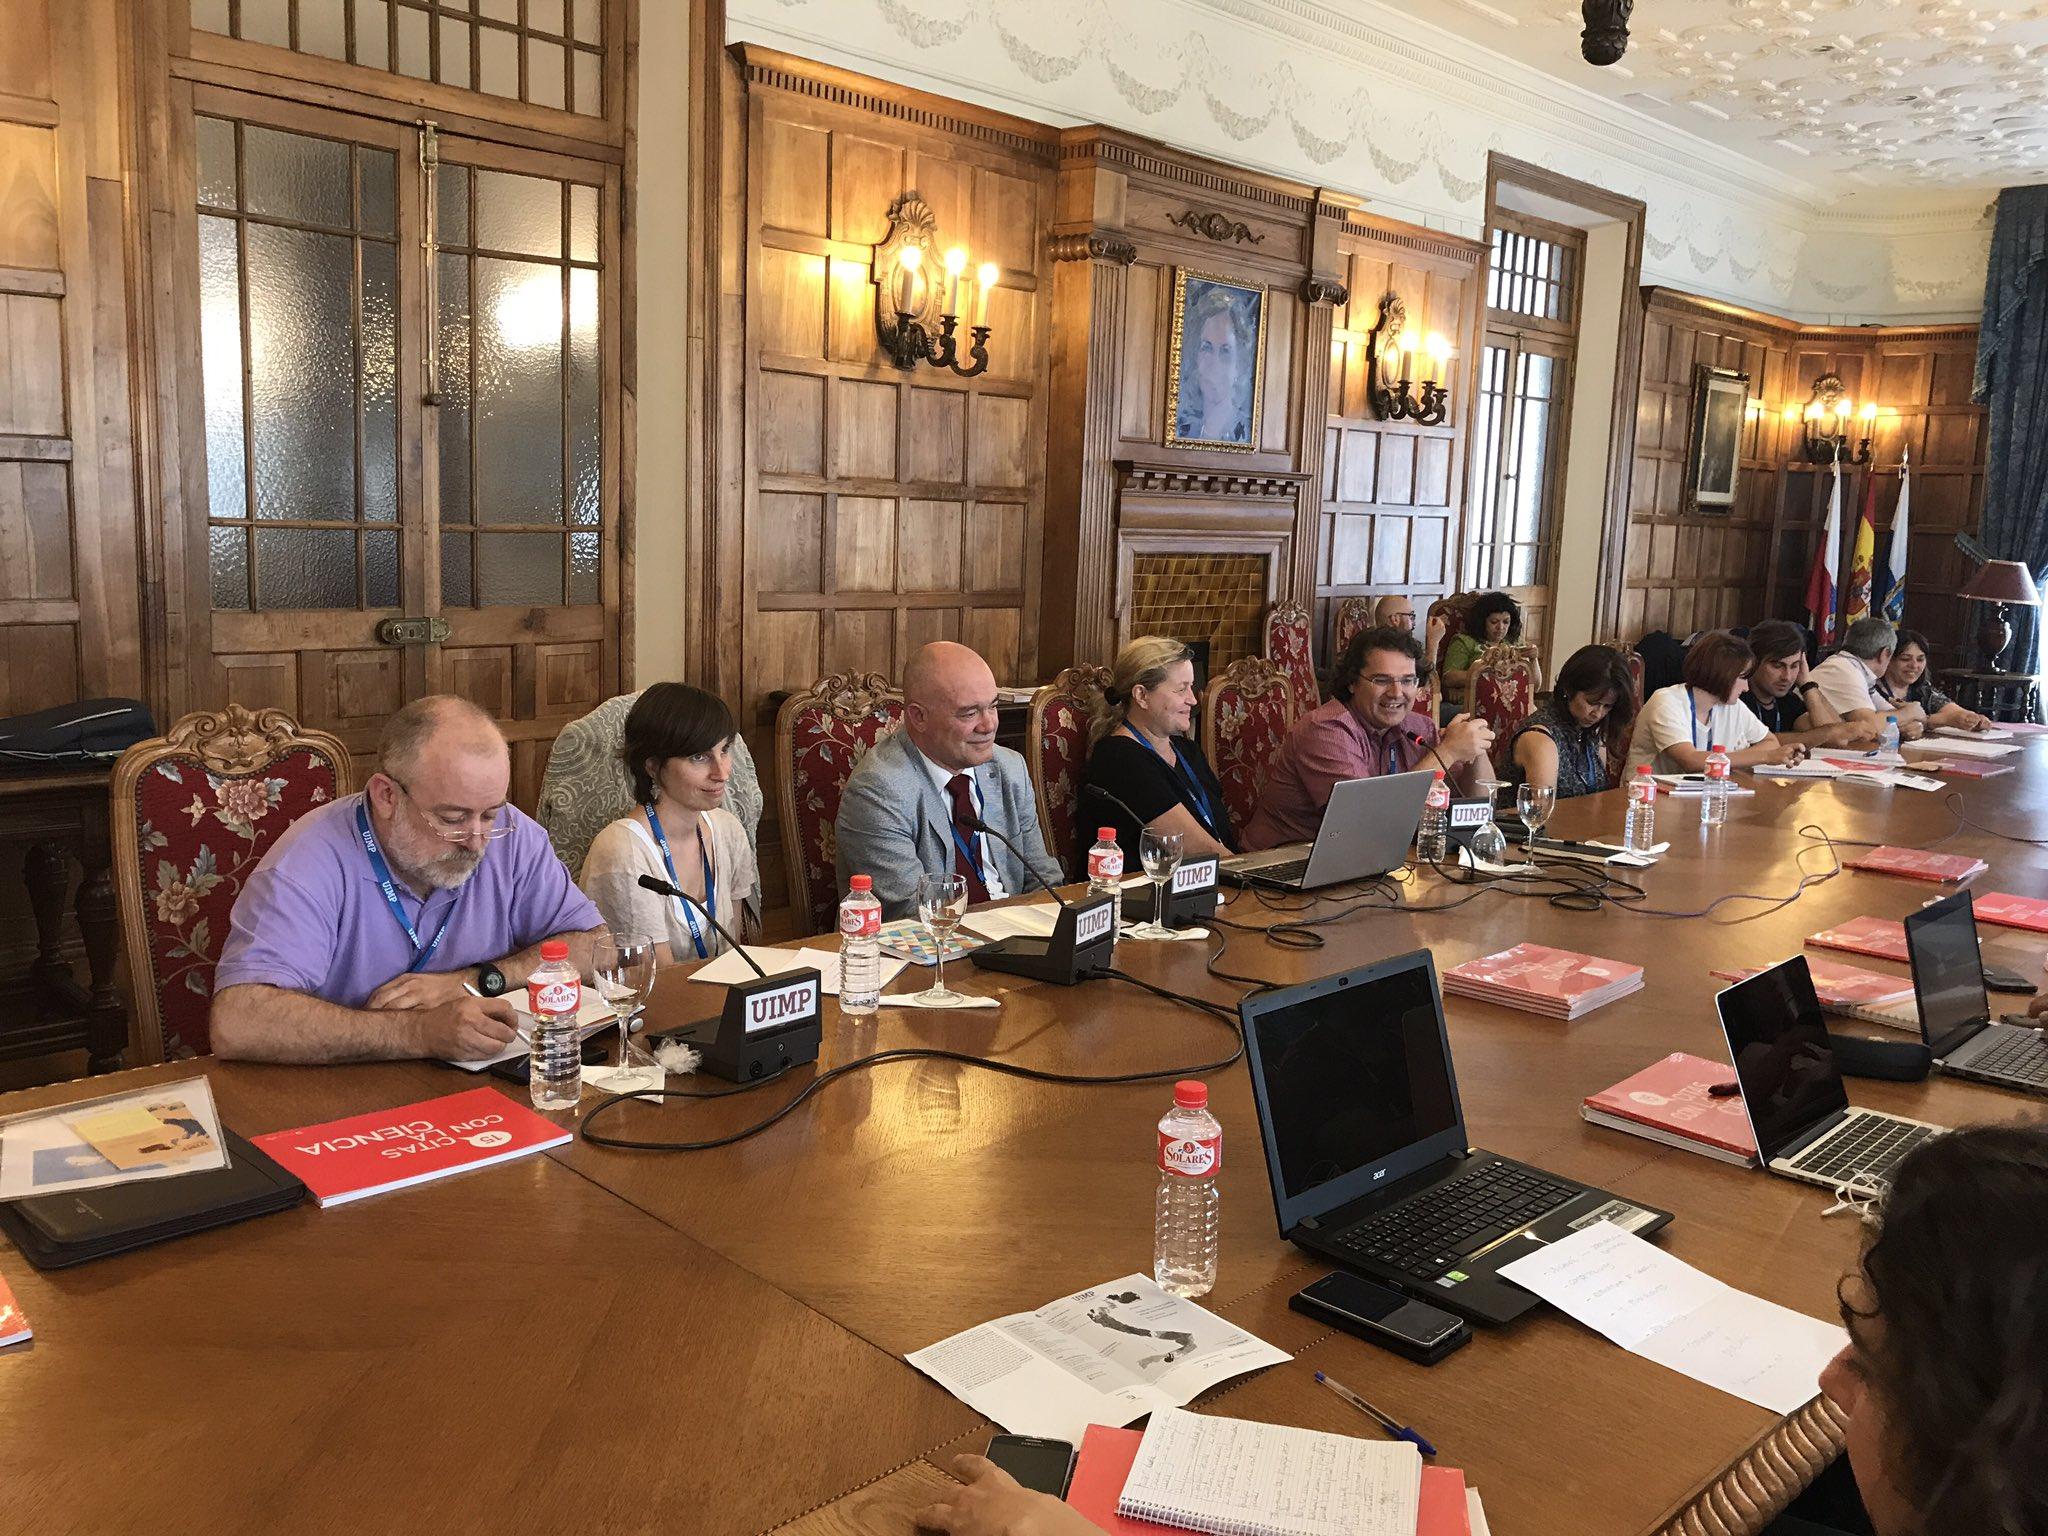 Comunicación científica e institucional deben tener relación funcional, no orgánica @Uhandrea en la mesa redonda #UIMPDivulgaCiencia https://t.co/fhzA6YMZUi